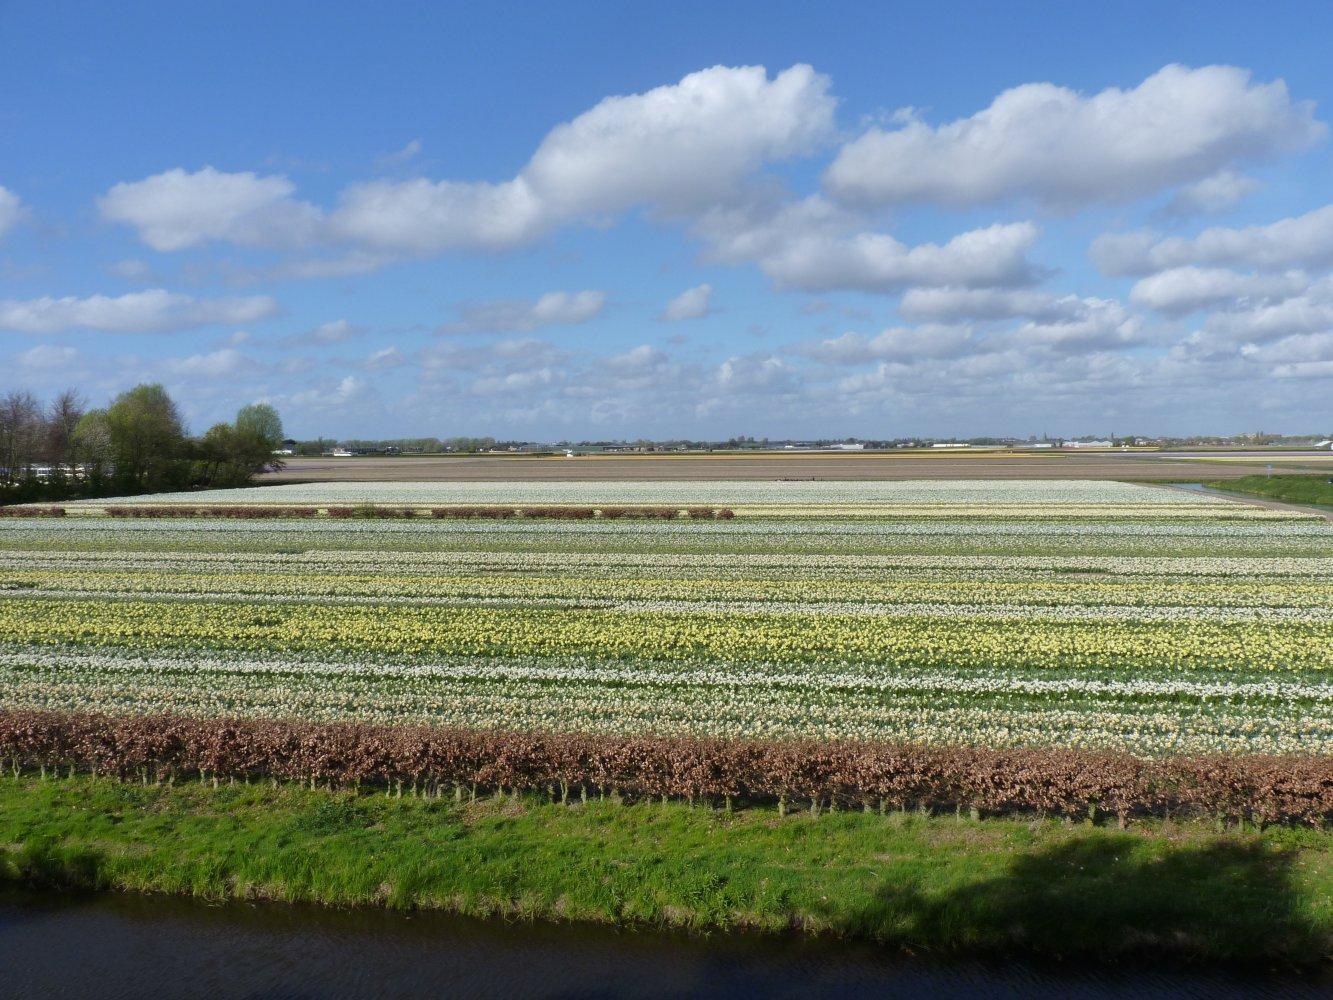 Фото P1210855.JPG. Нидерланды, Zuid-Holland, Lisse, Stationsweg, 164